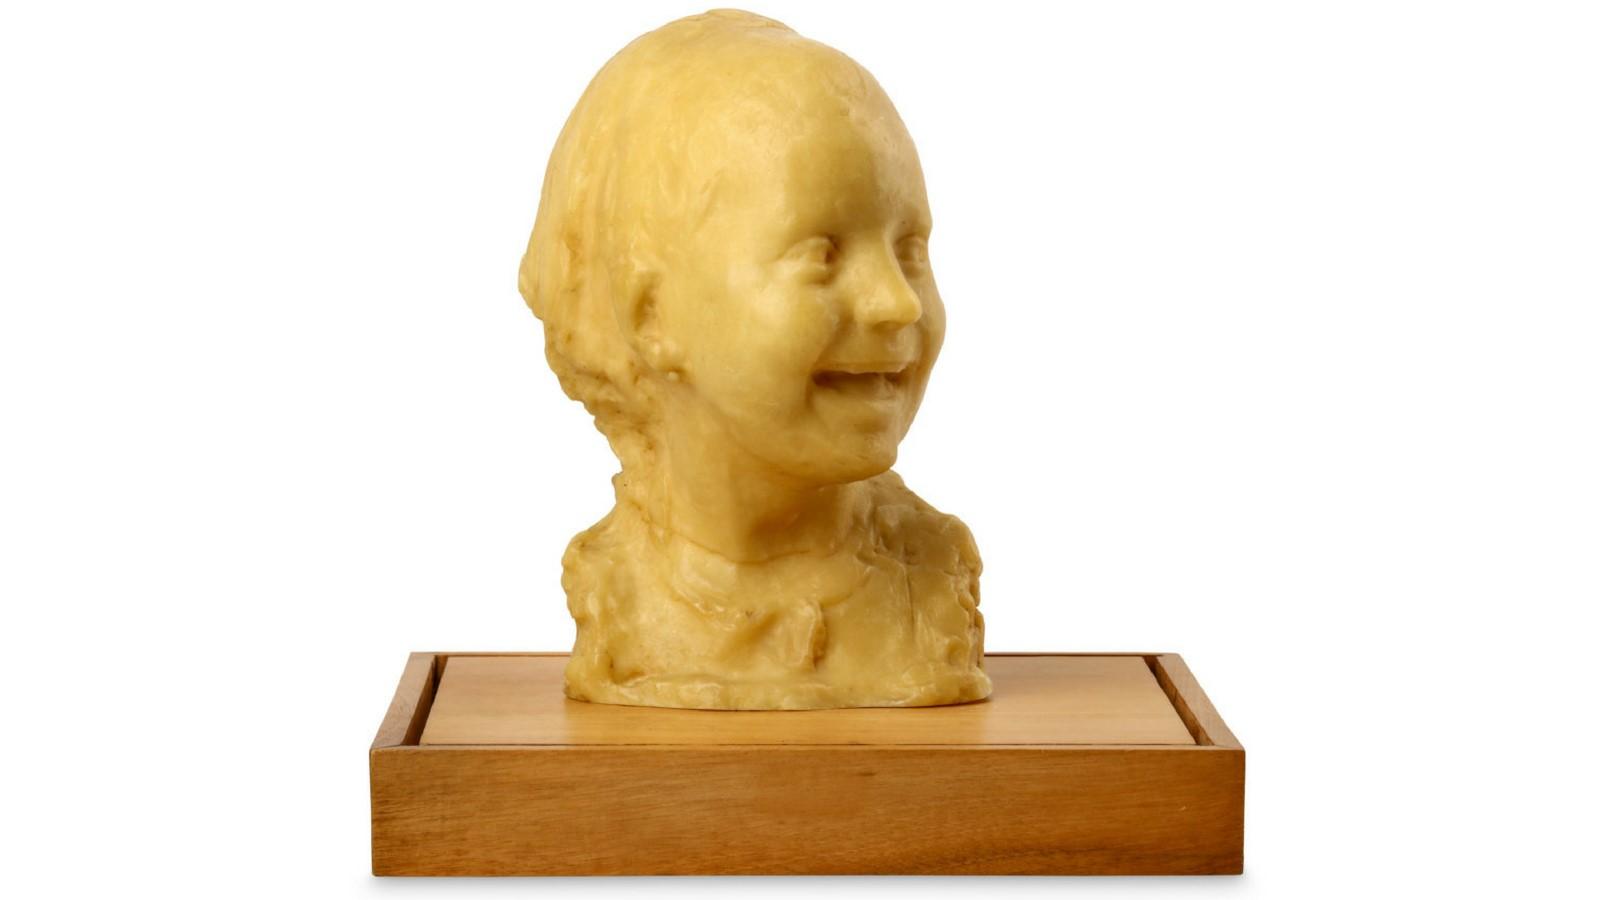 Rare wax head by Post-Impressionist sculptor Medardo Rosso